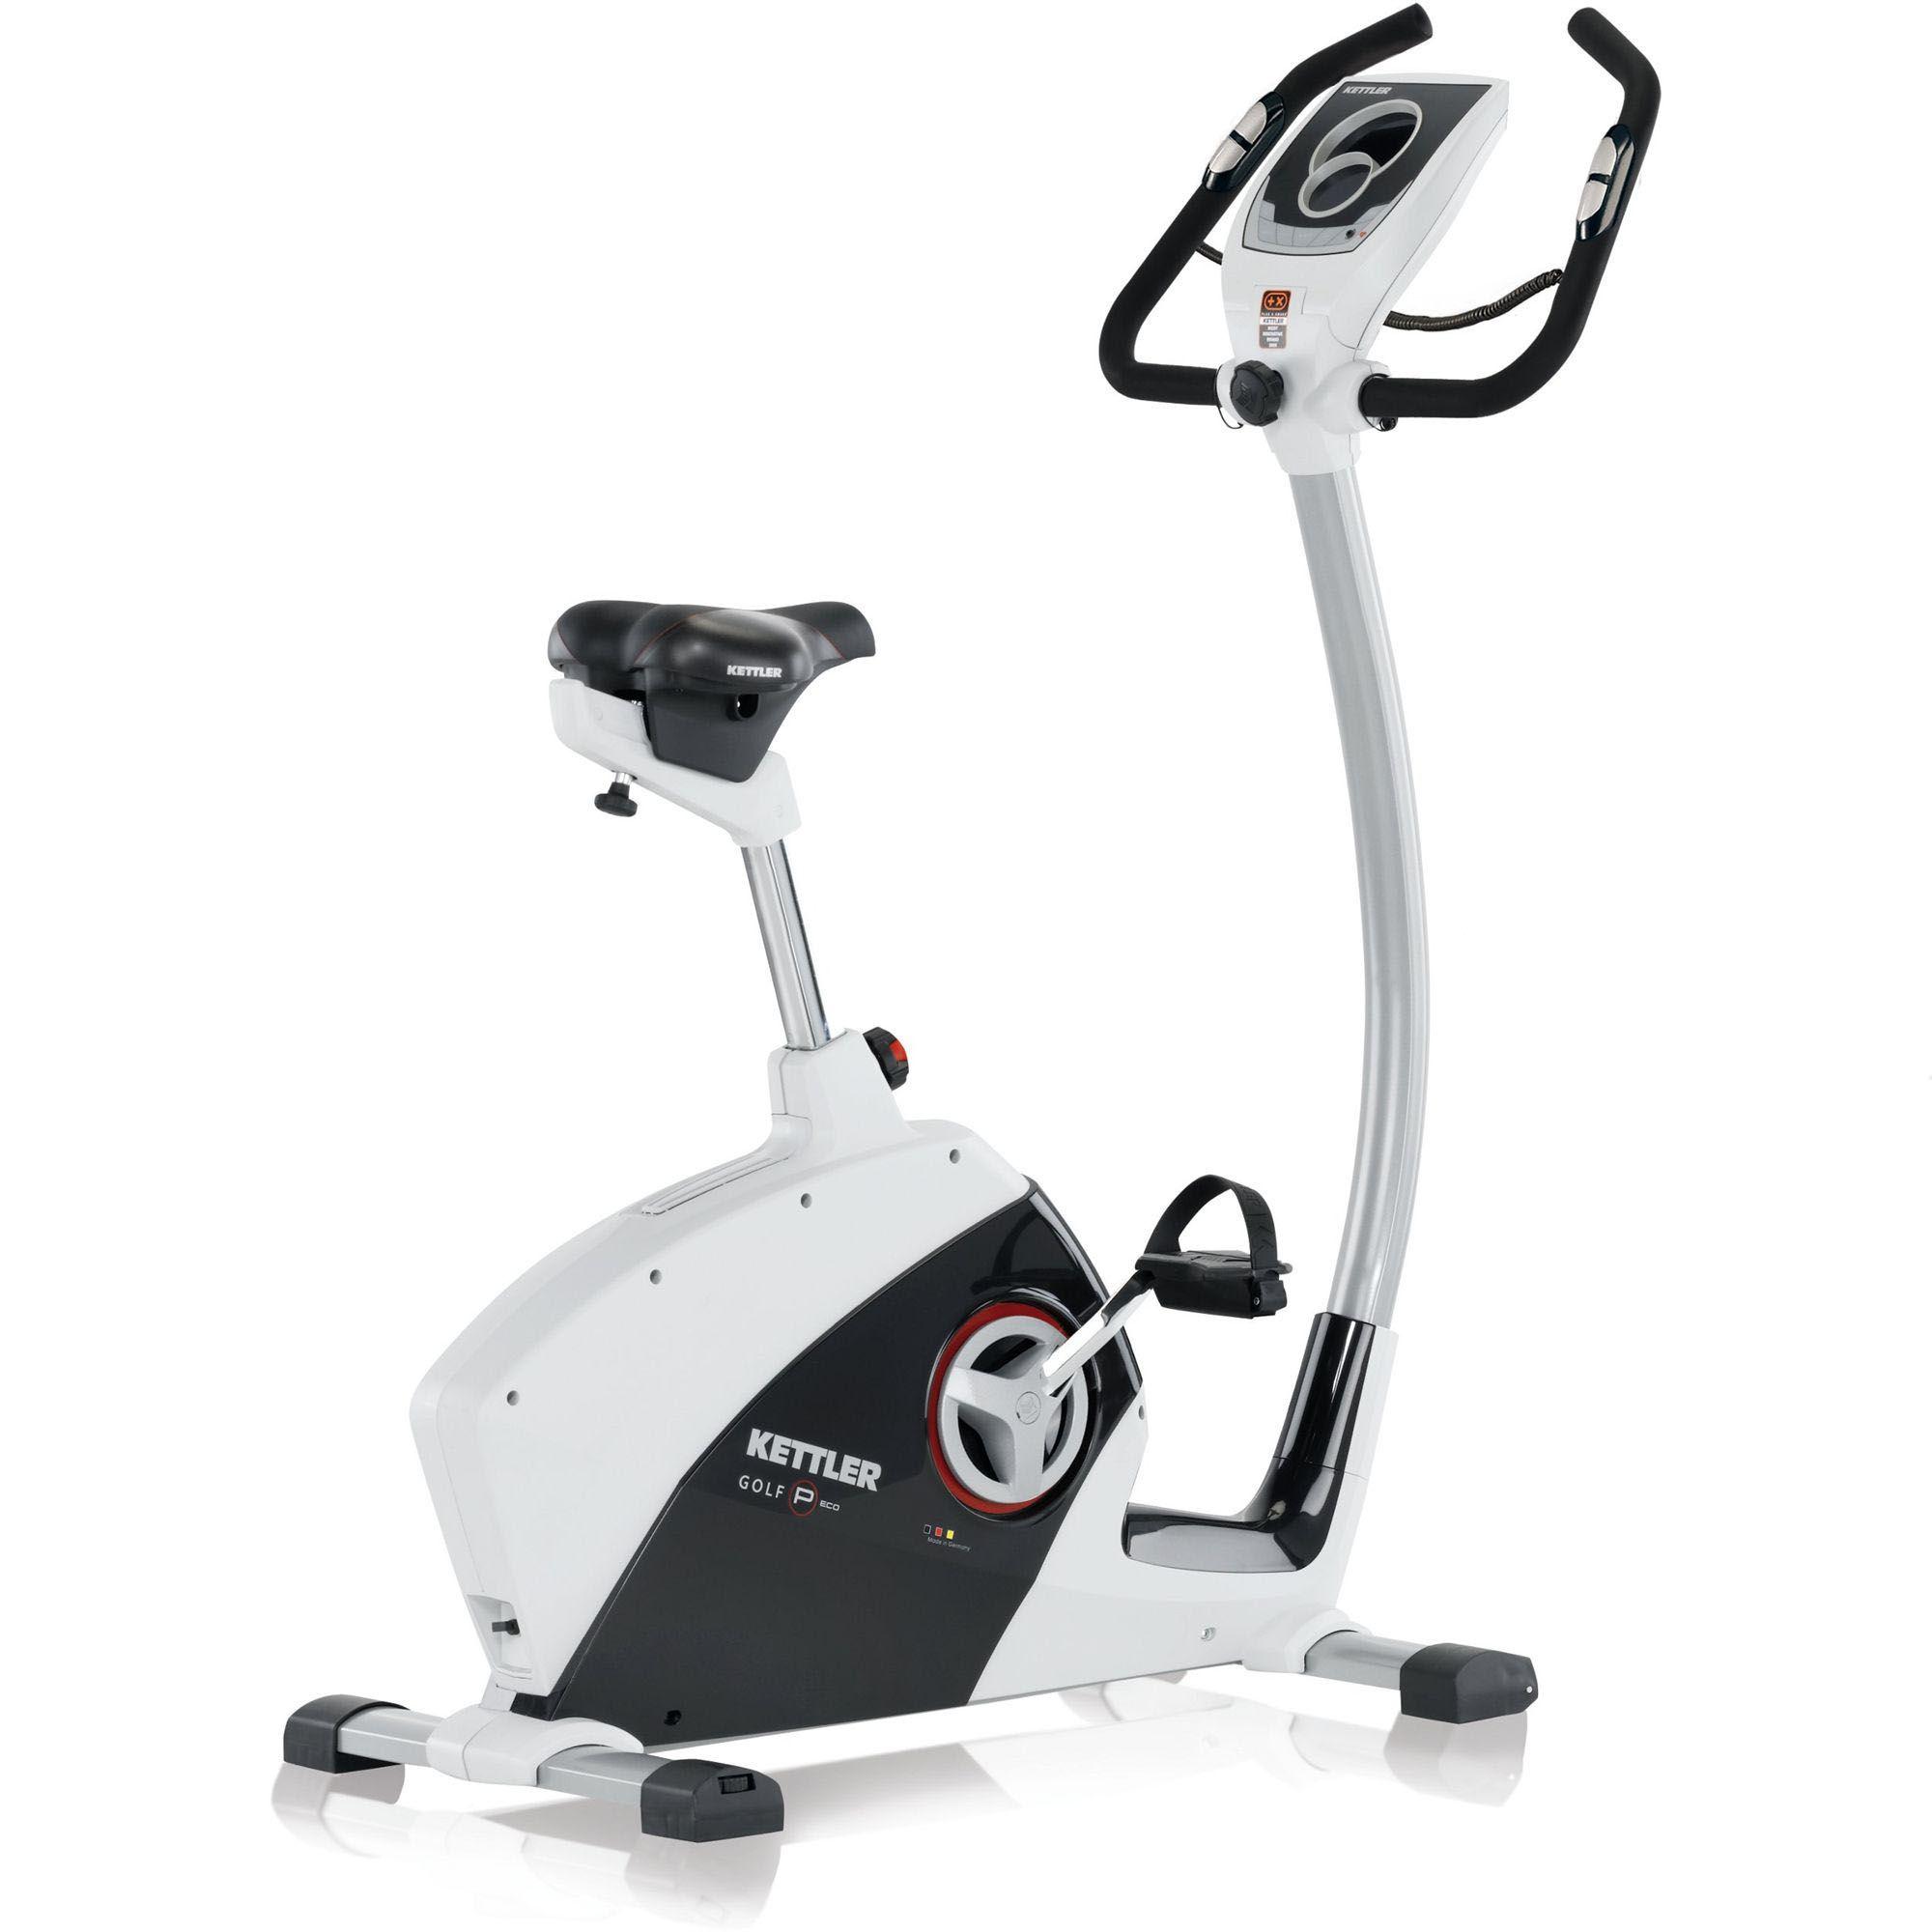 Kettler Golf P Eco Exercise Bike Sweatband Com